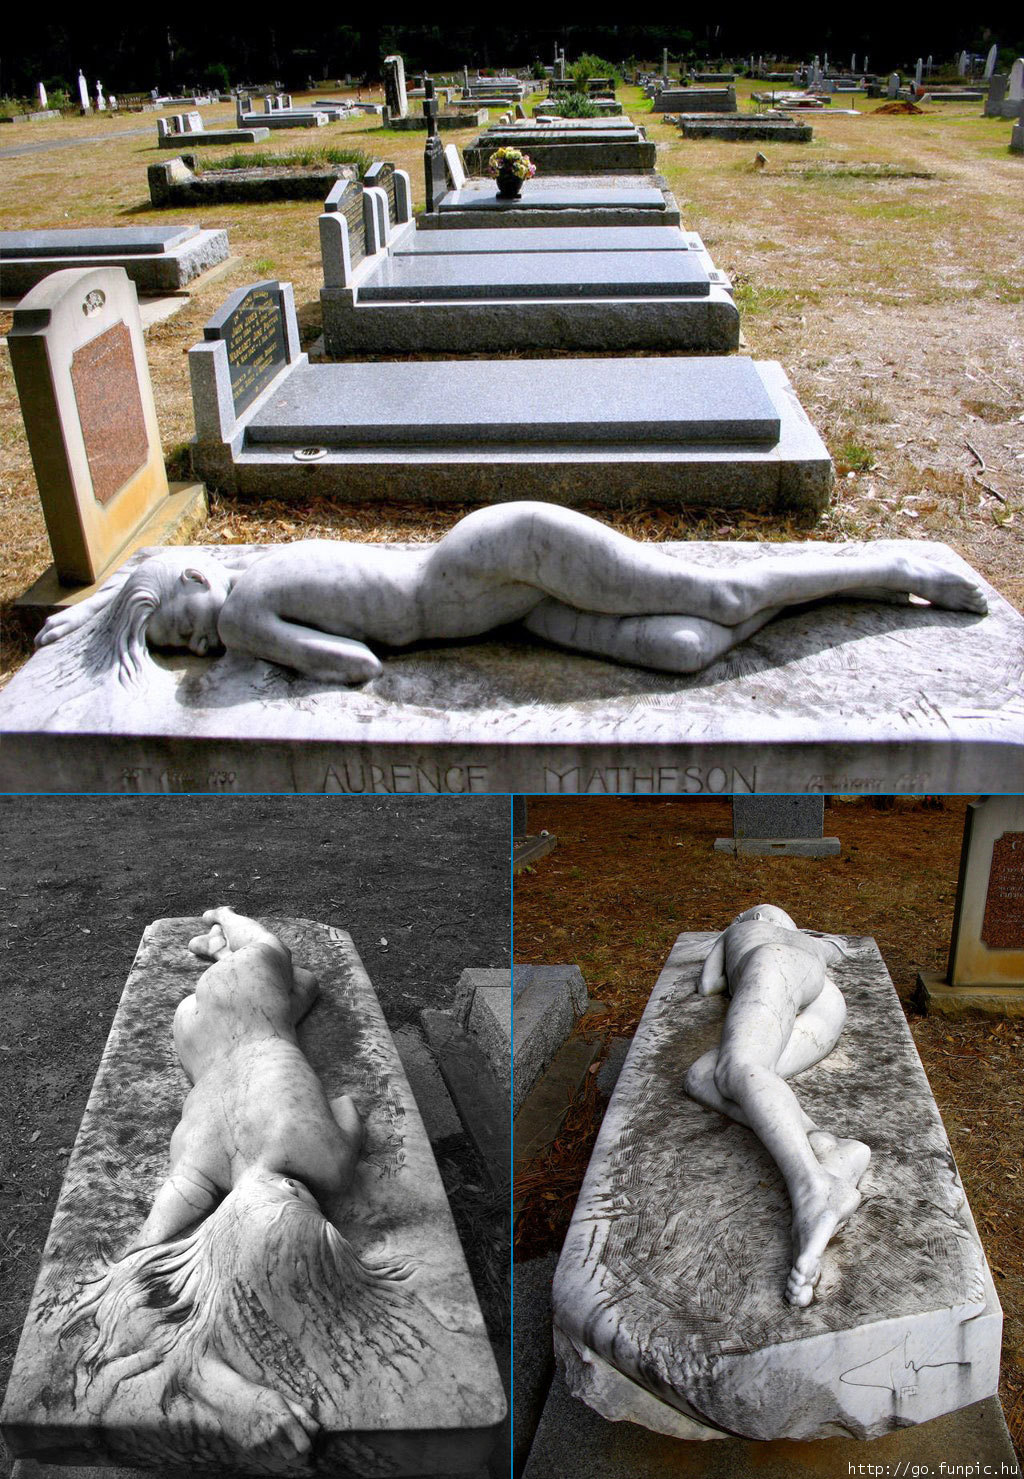 Diimaaz Azza Kuburan2 Yang Aneh Tapi Nyata